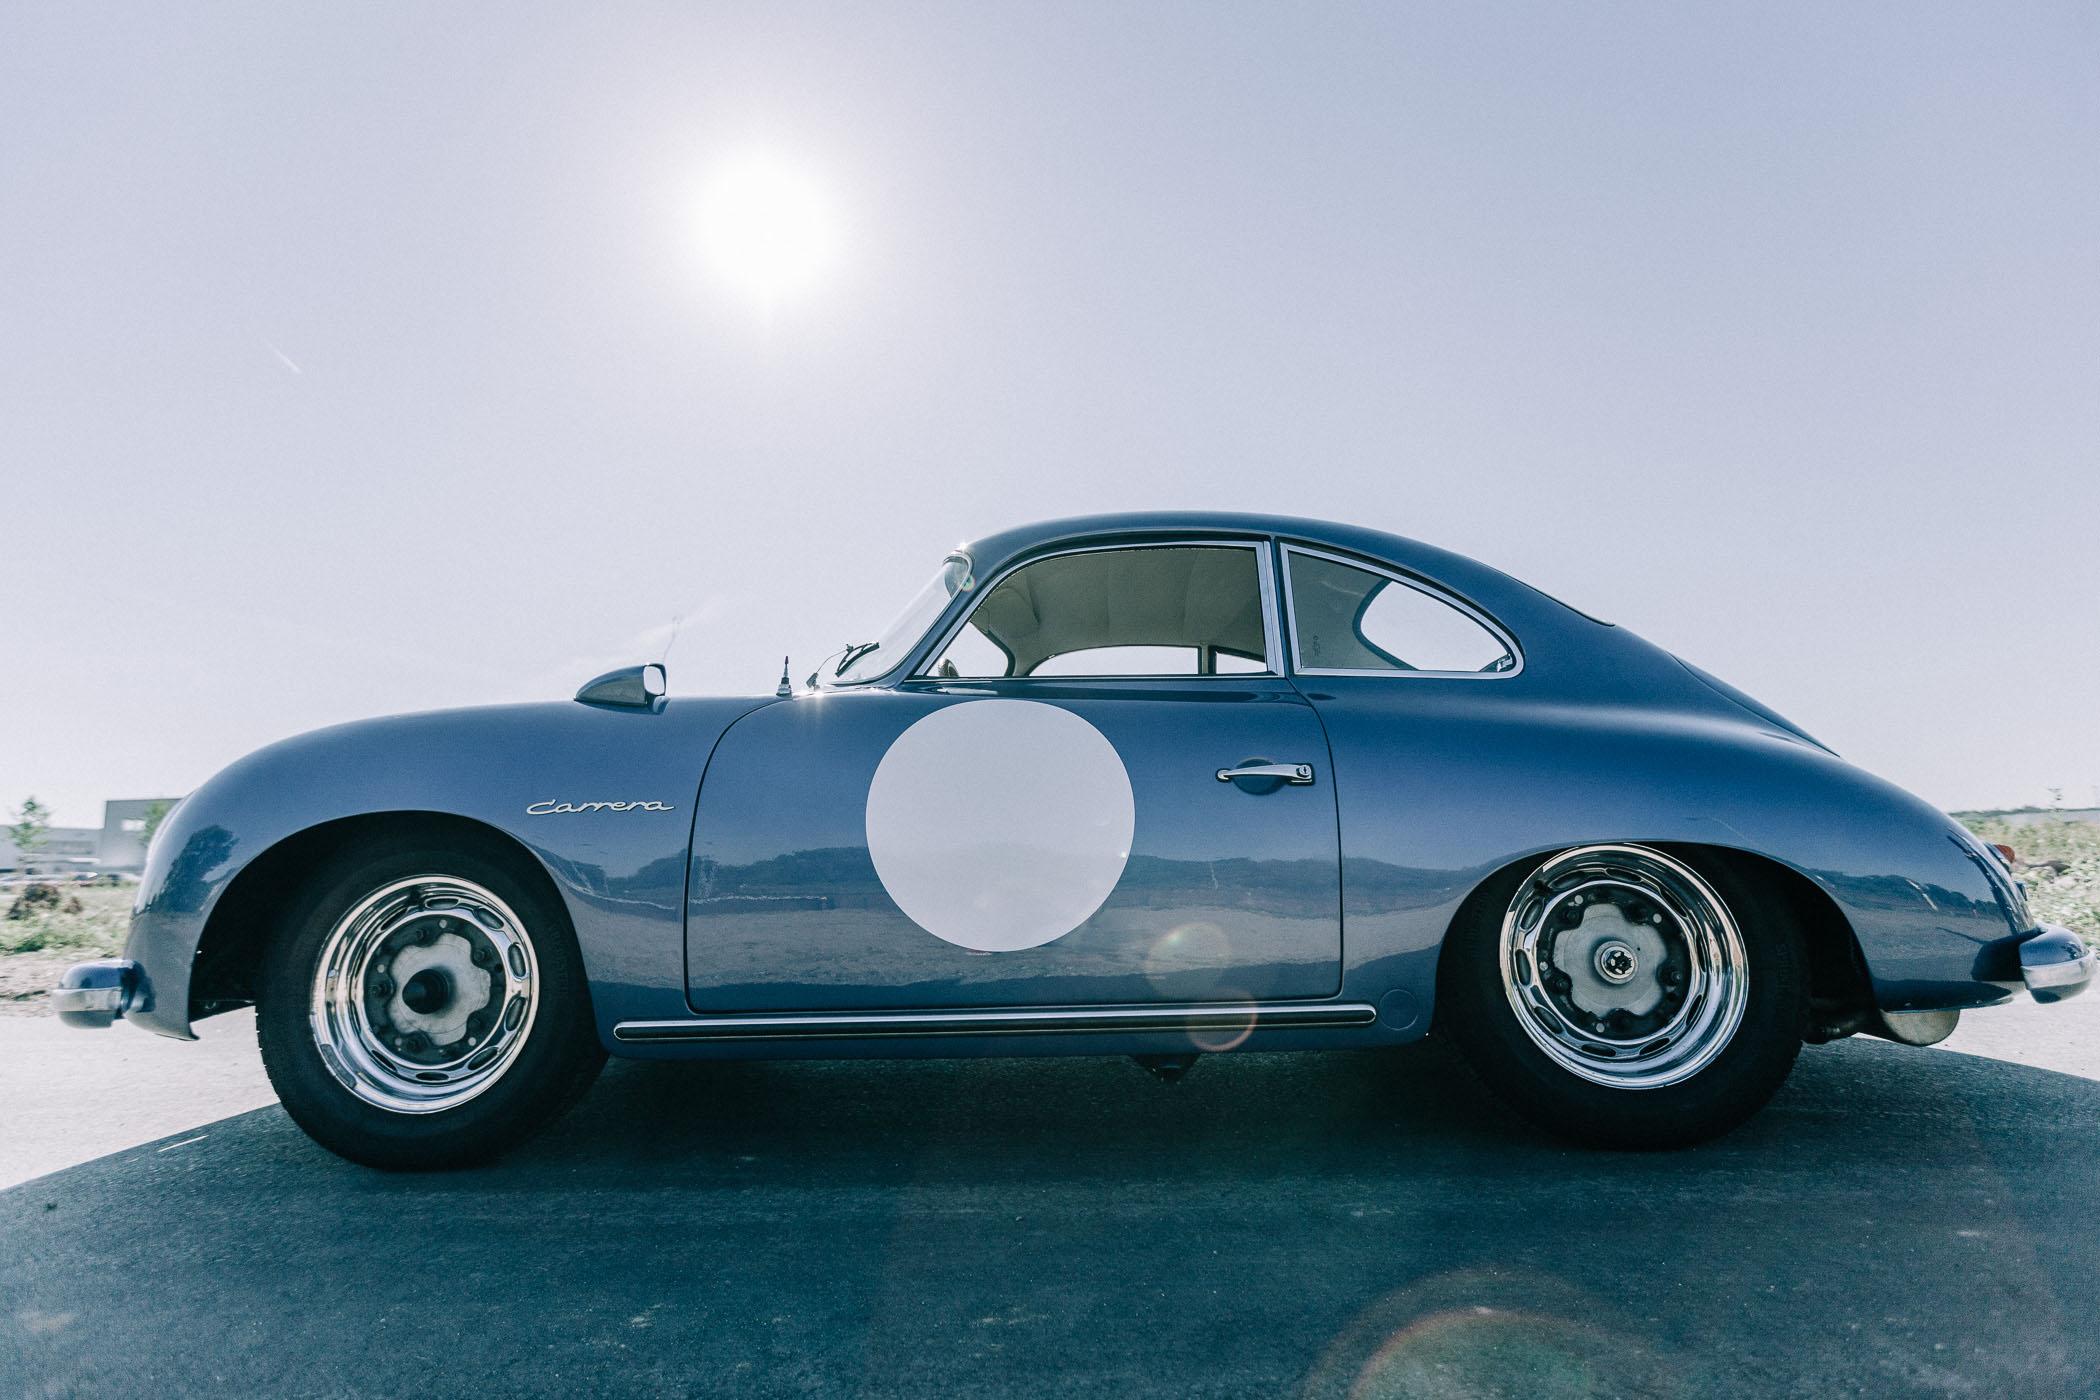 Porsche , Porsche Carrera , Ur-Carrera, Florian Kresse, 911, 356, luftgekühlt, aircooled, Oldtimer, Vintage car, Fotografie, Photography